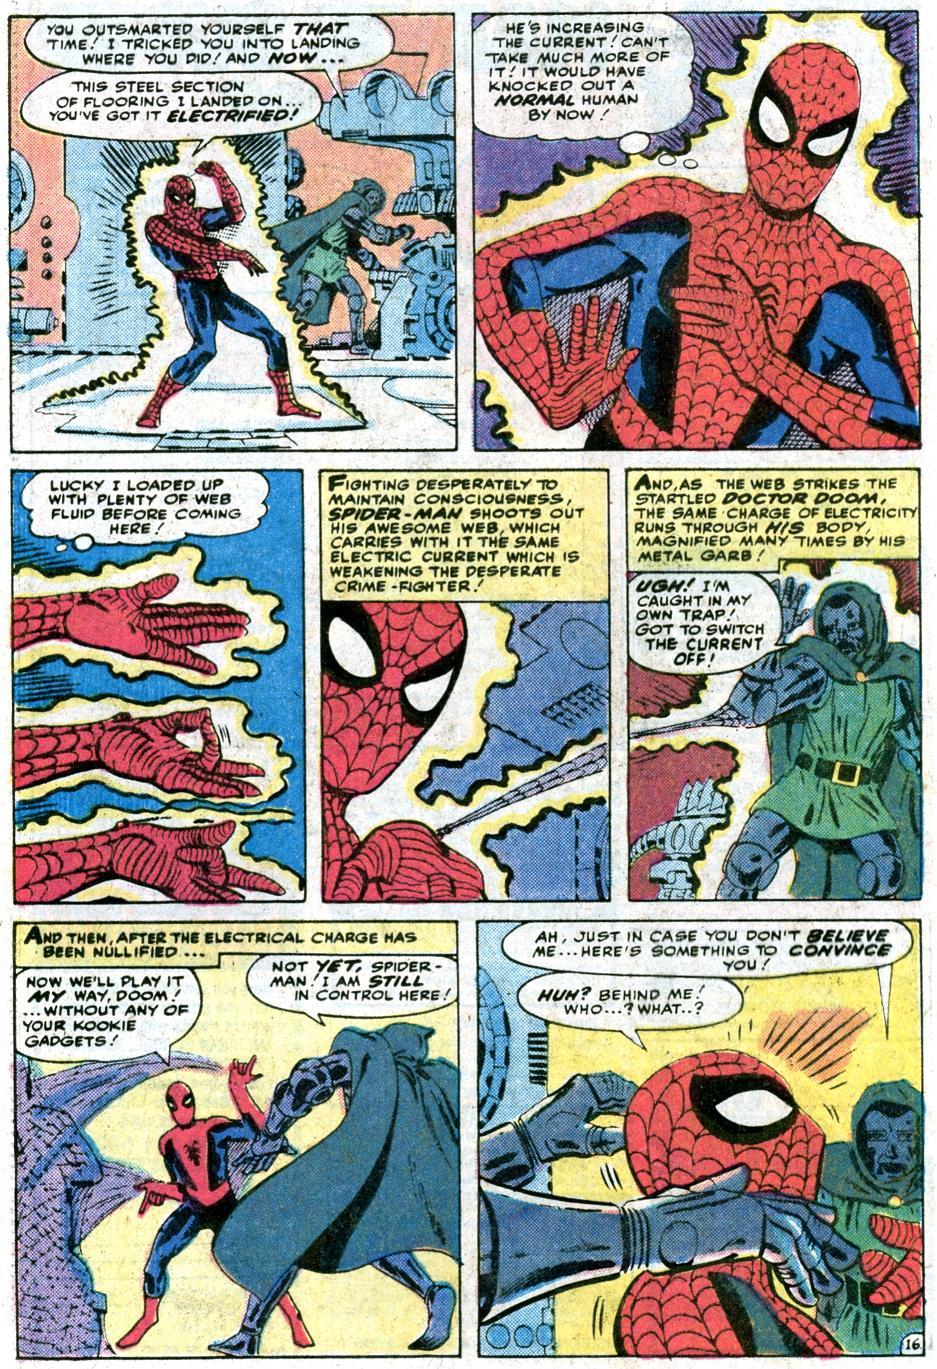 Marvel Masterworks: The Amazing Spider-man Volume 1. Soft Cover. Fine Condition